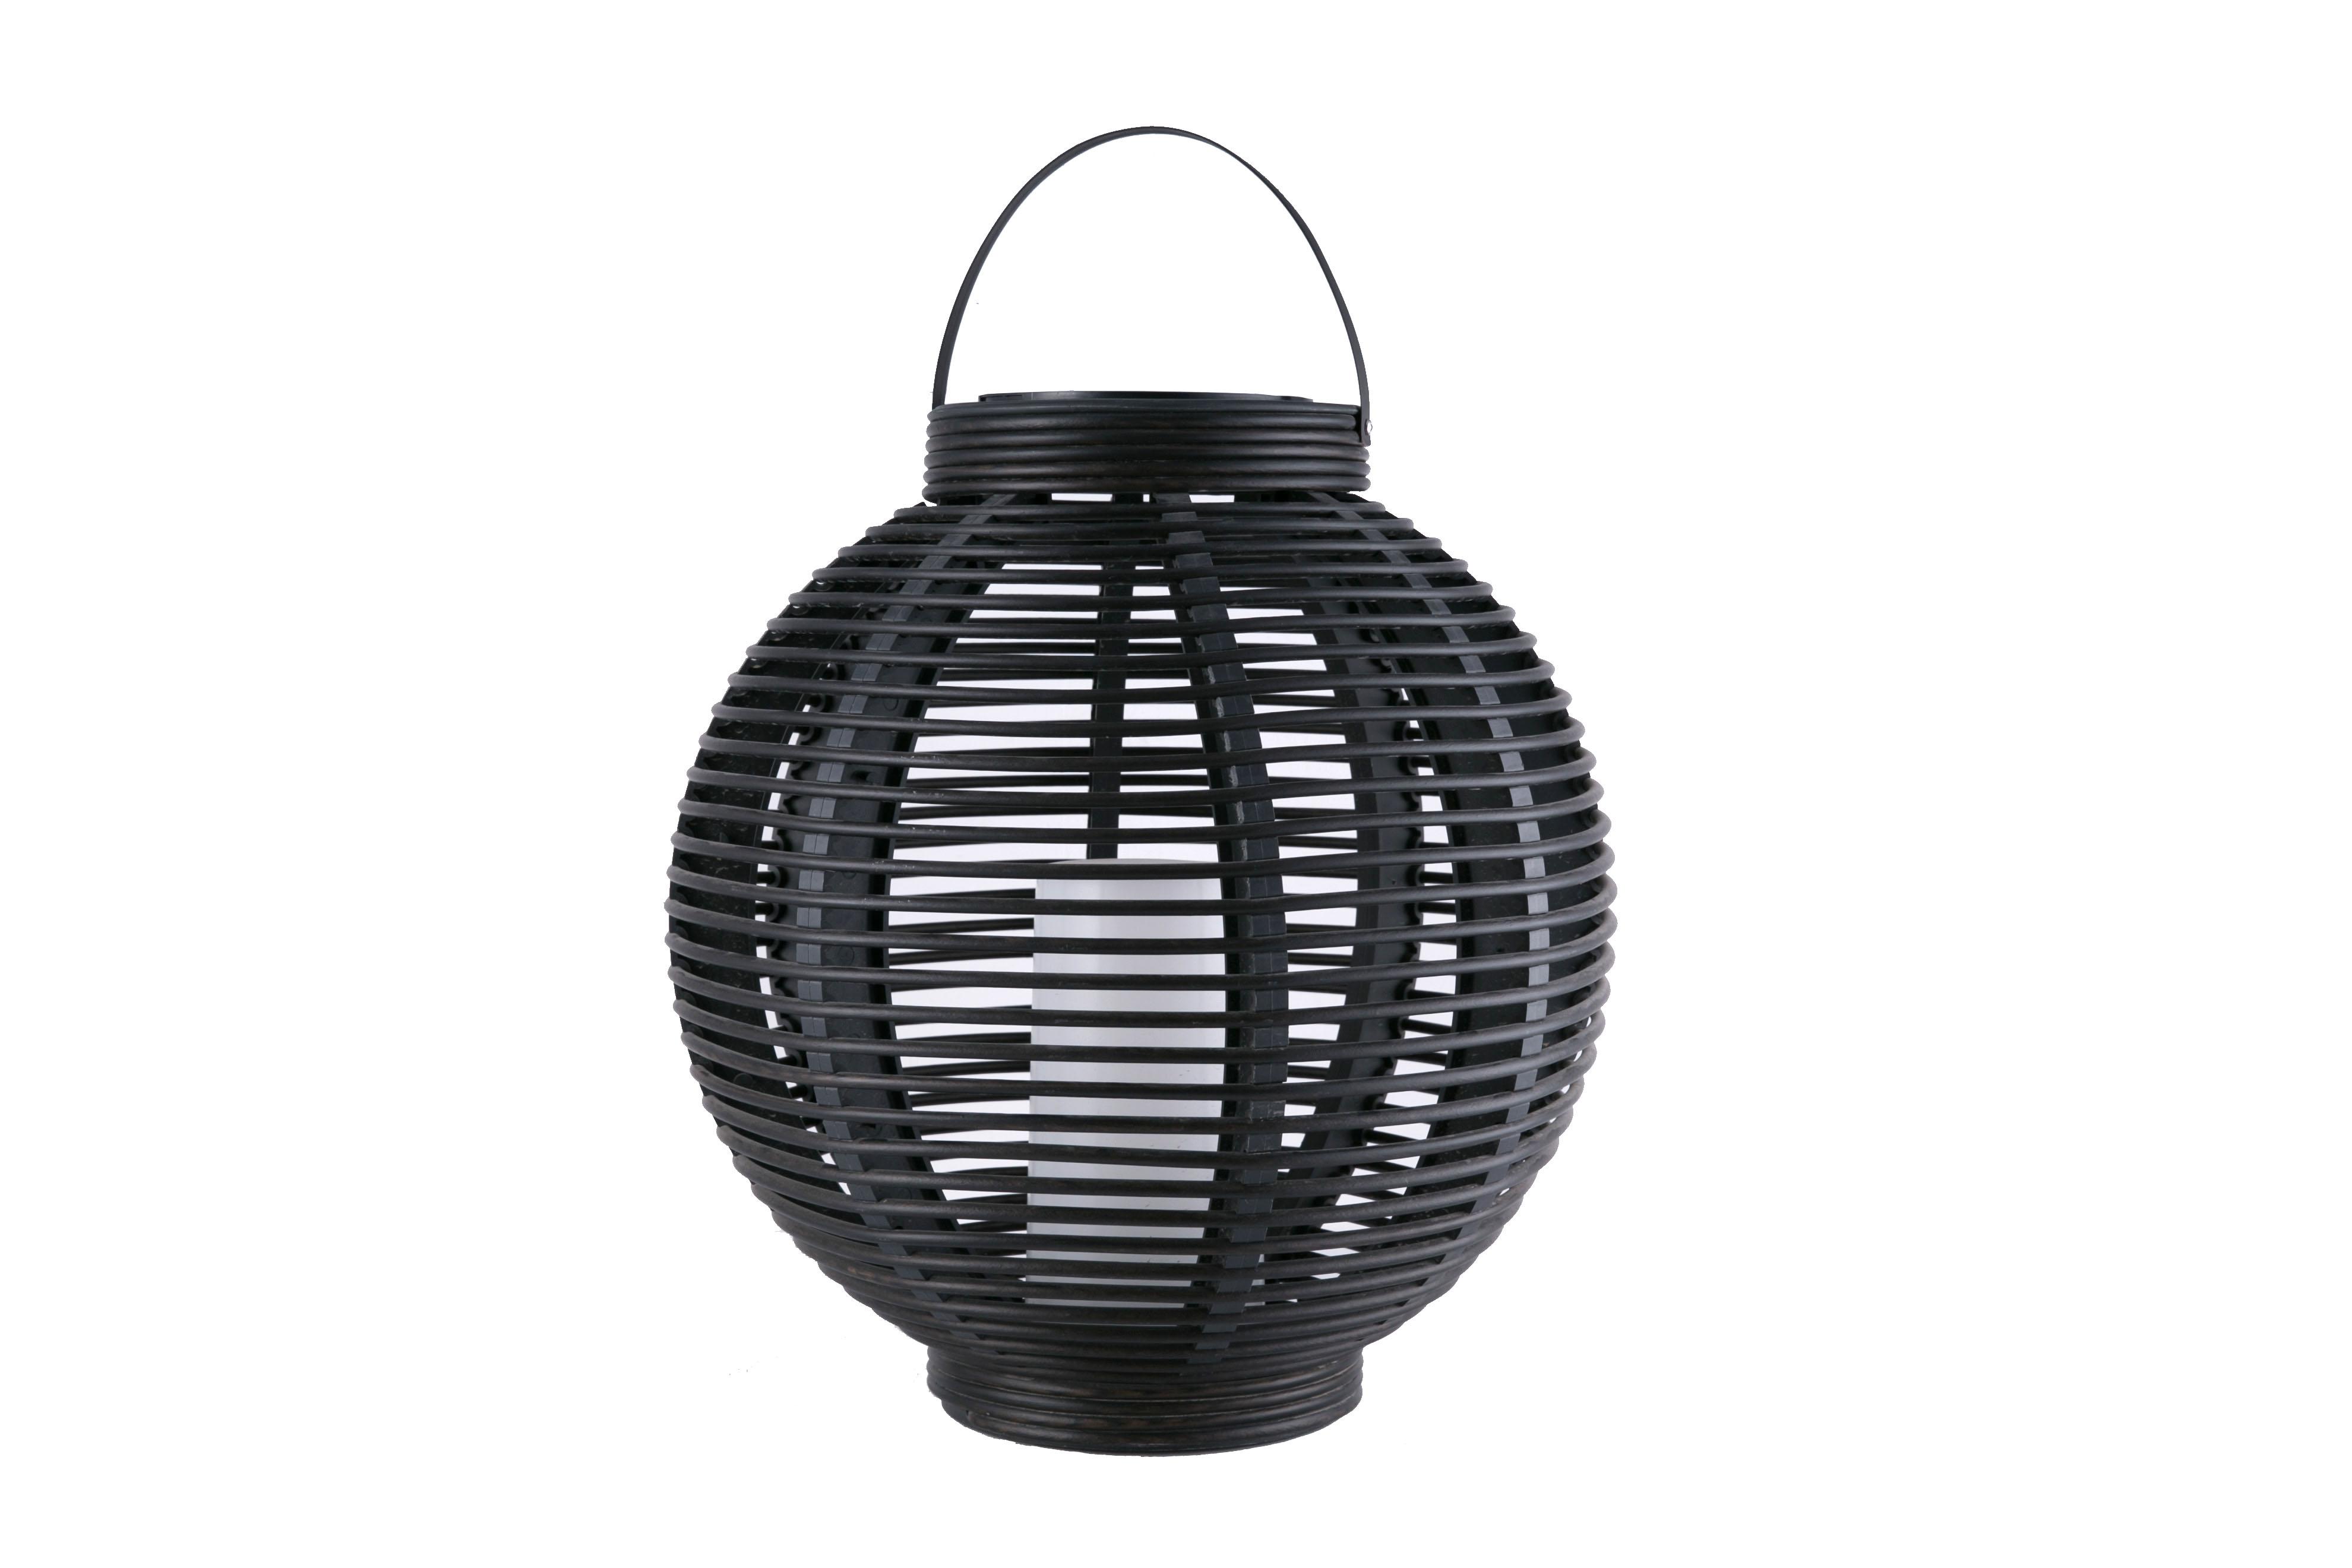 A-Solar Large-Sized Round Rattan Basket